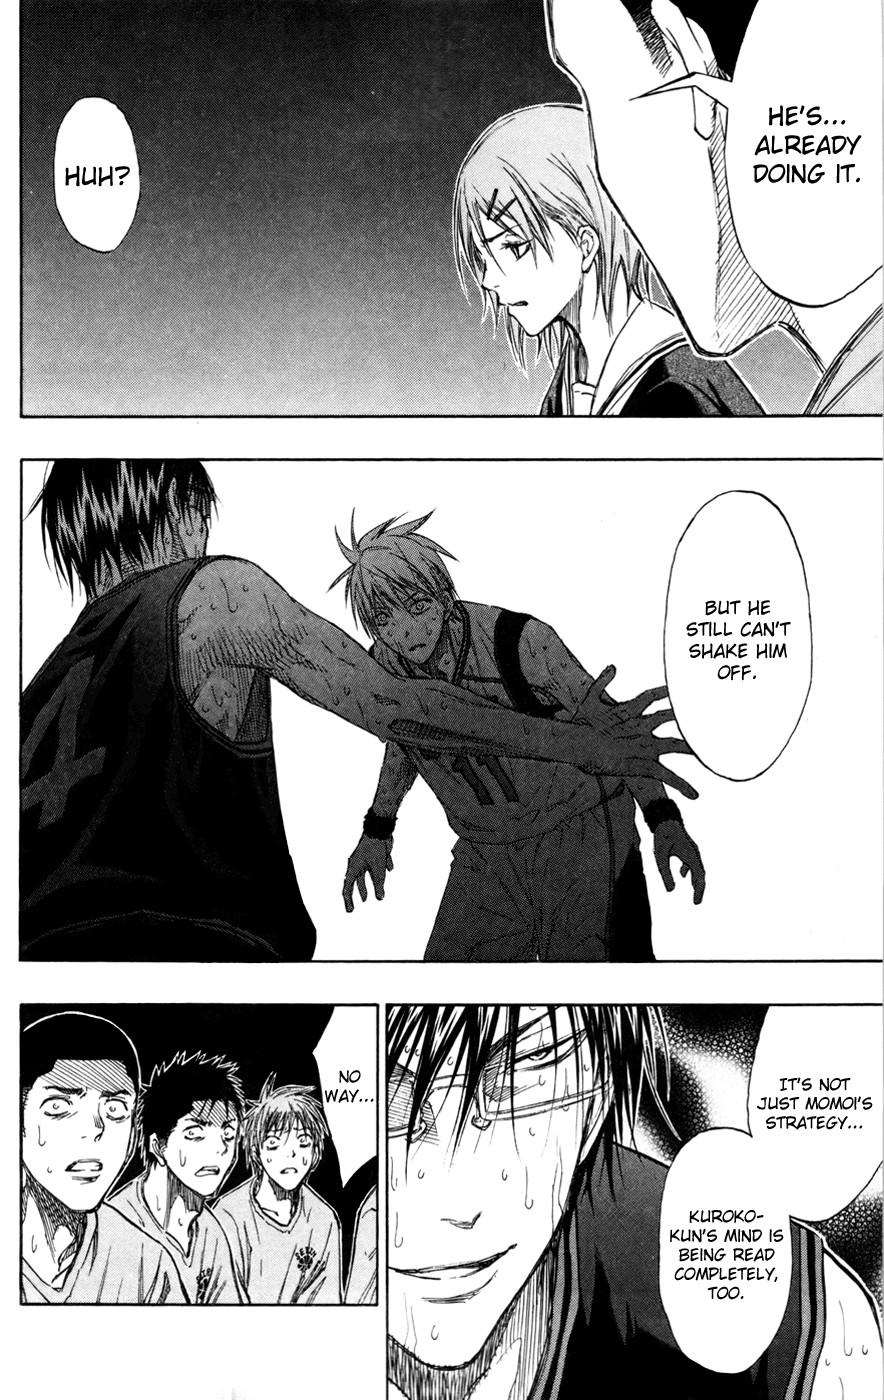 Kuroko no Basket Manga Chapter 127 - Image 22